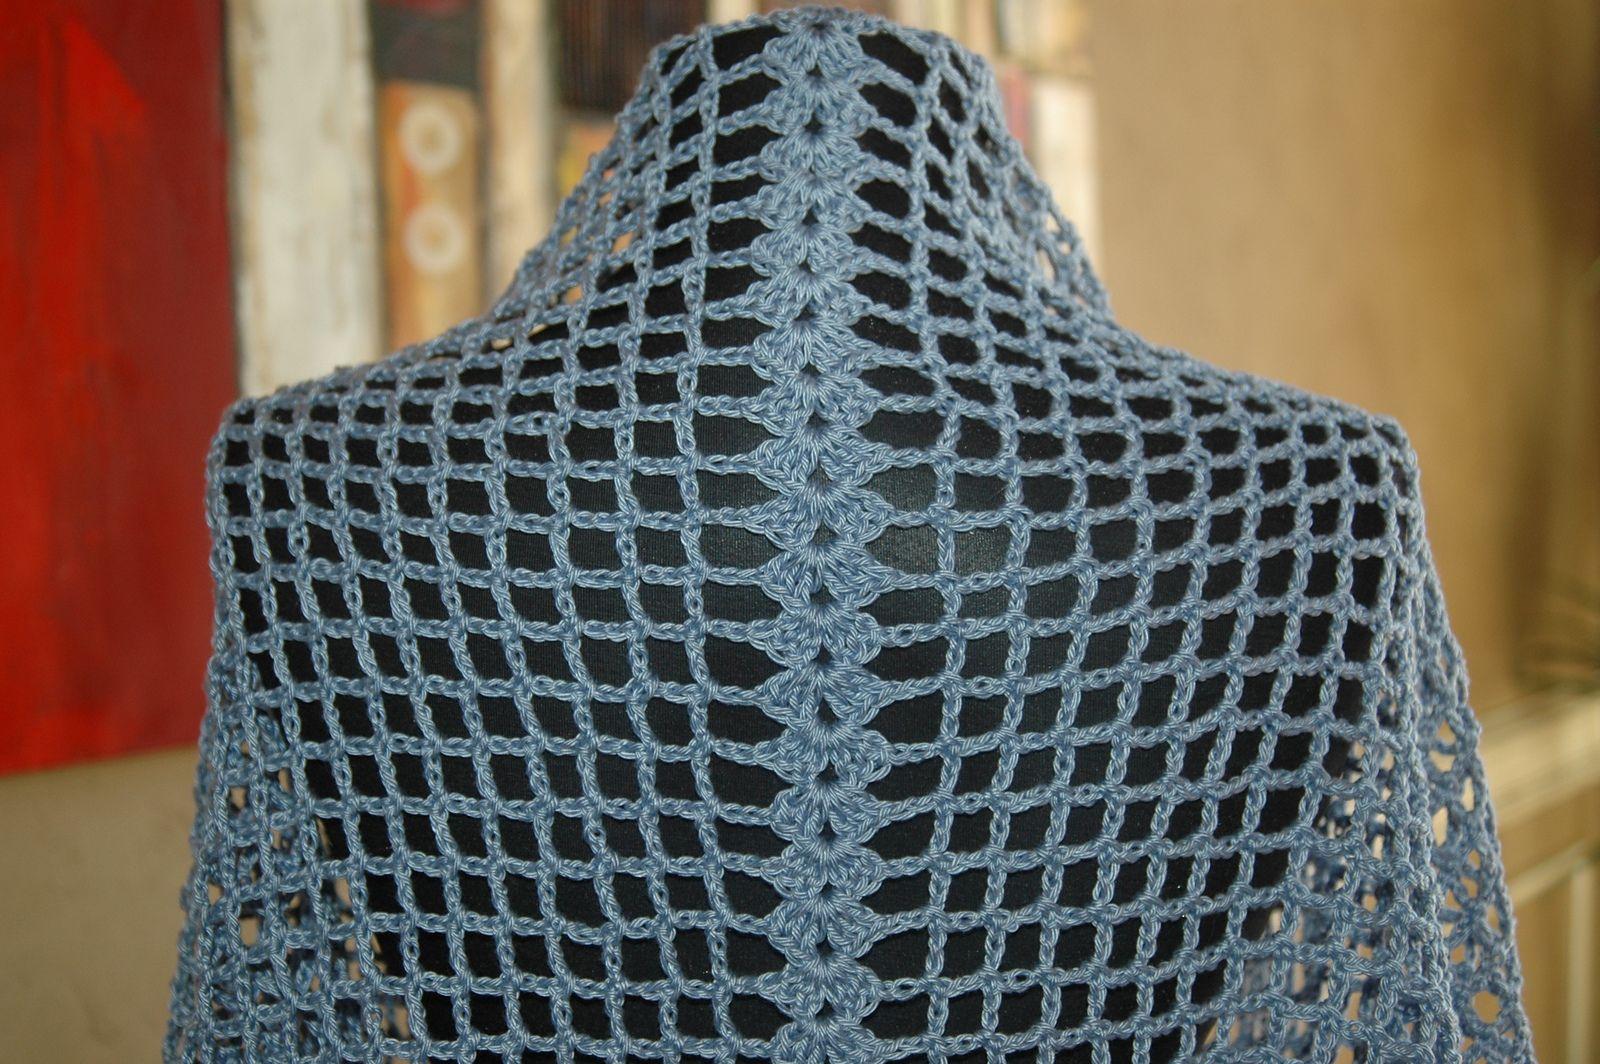 Ravelry: French Blue Shawl DK276 by Cristina Mershon